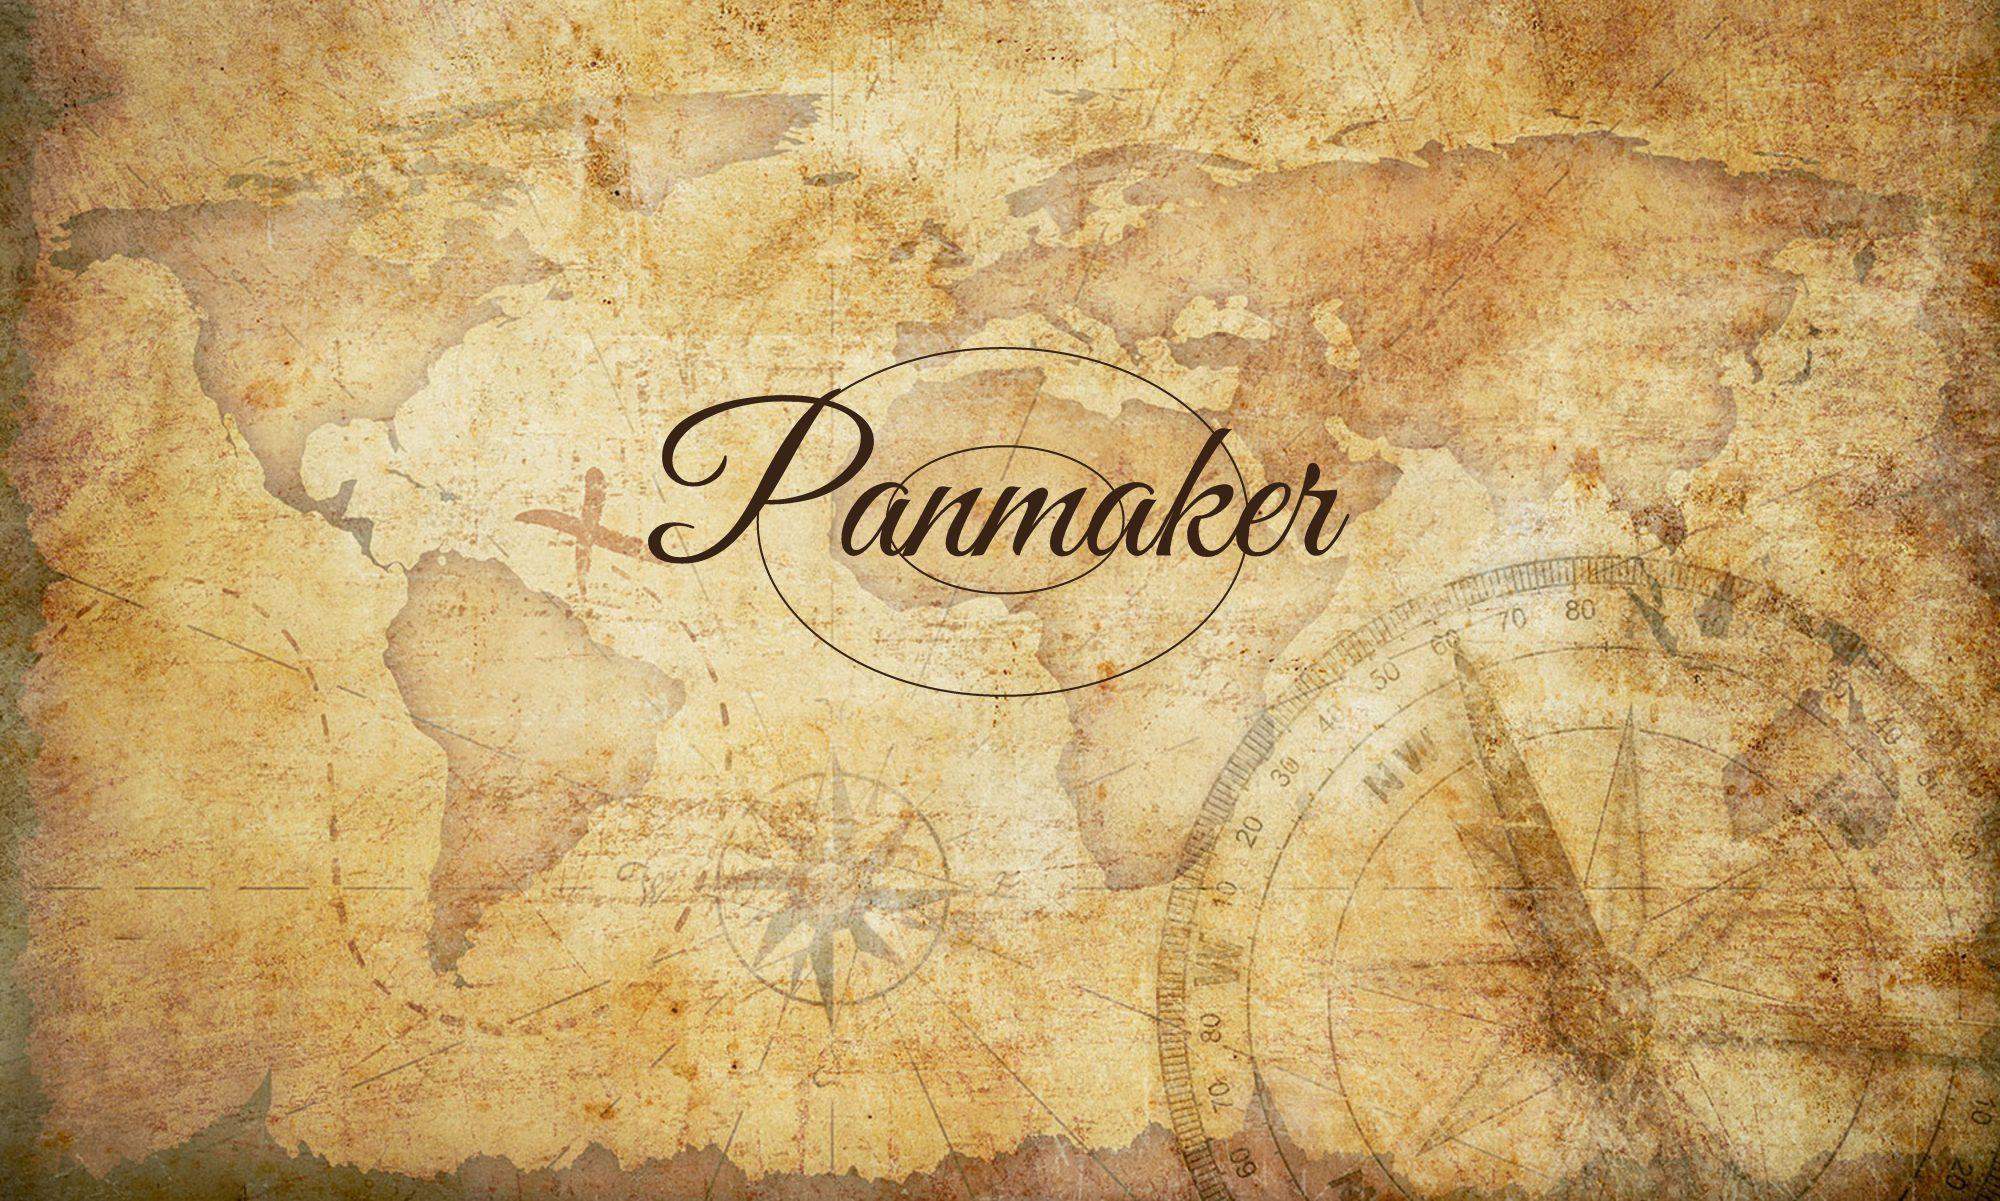 Panmaker.eu